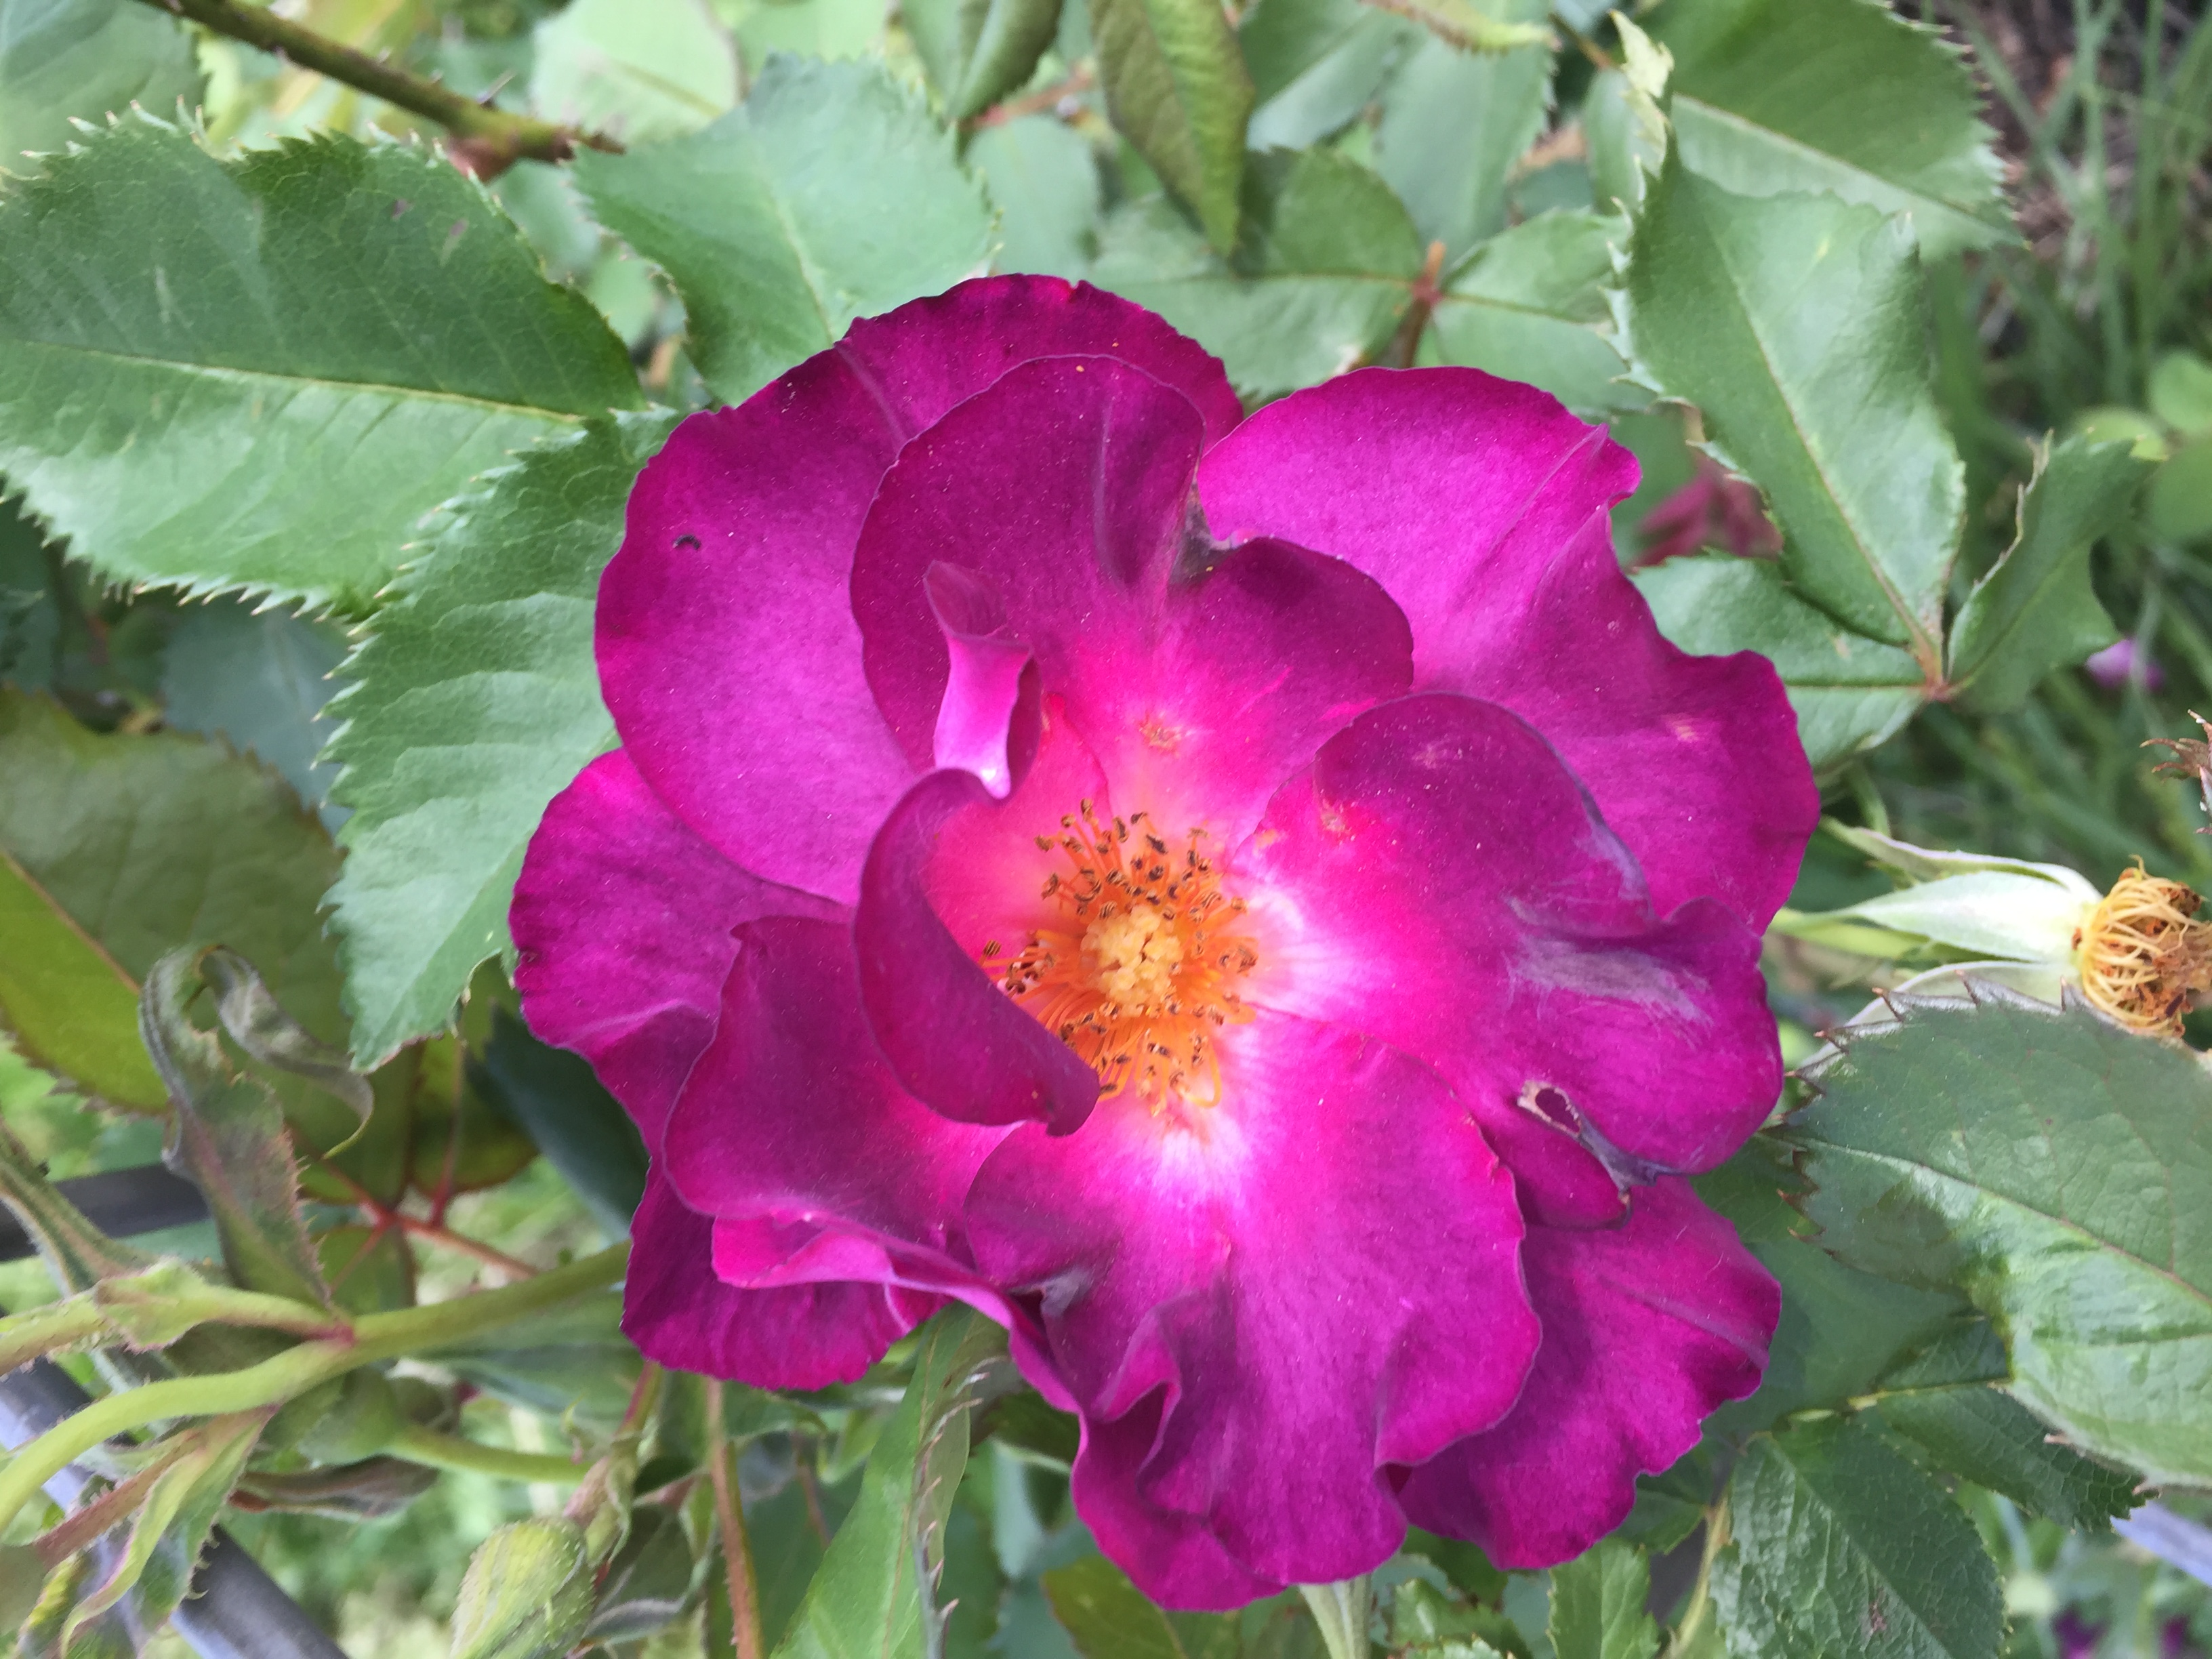 3CC0411C FBC8 48B8 8AF1 0BDC69B480C9 Irises, Roses, and Azaleas — Oh My!